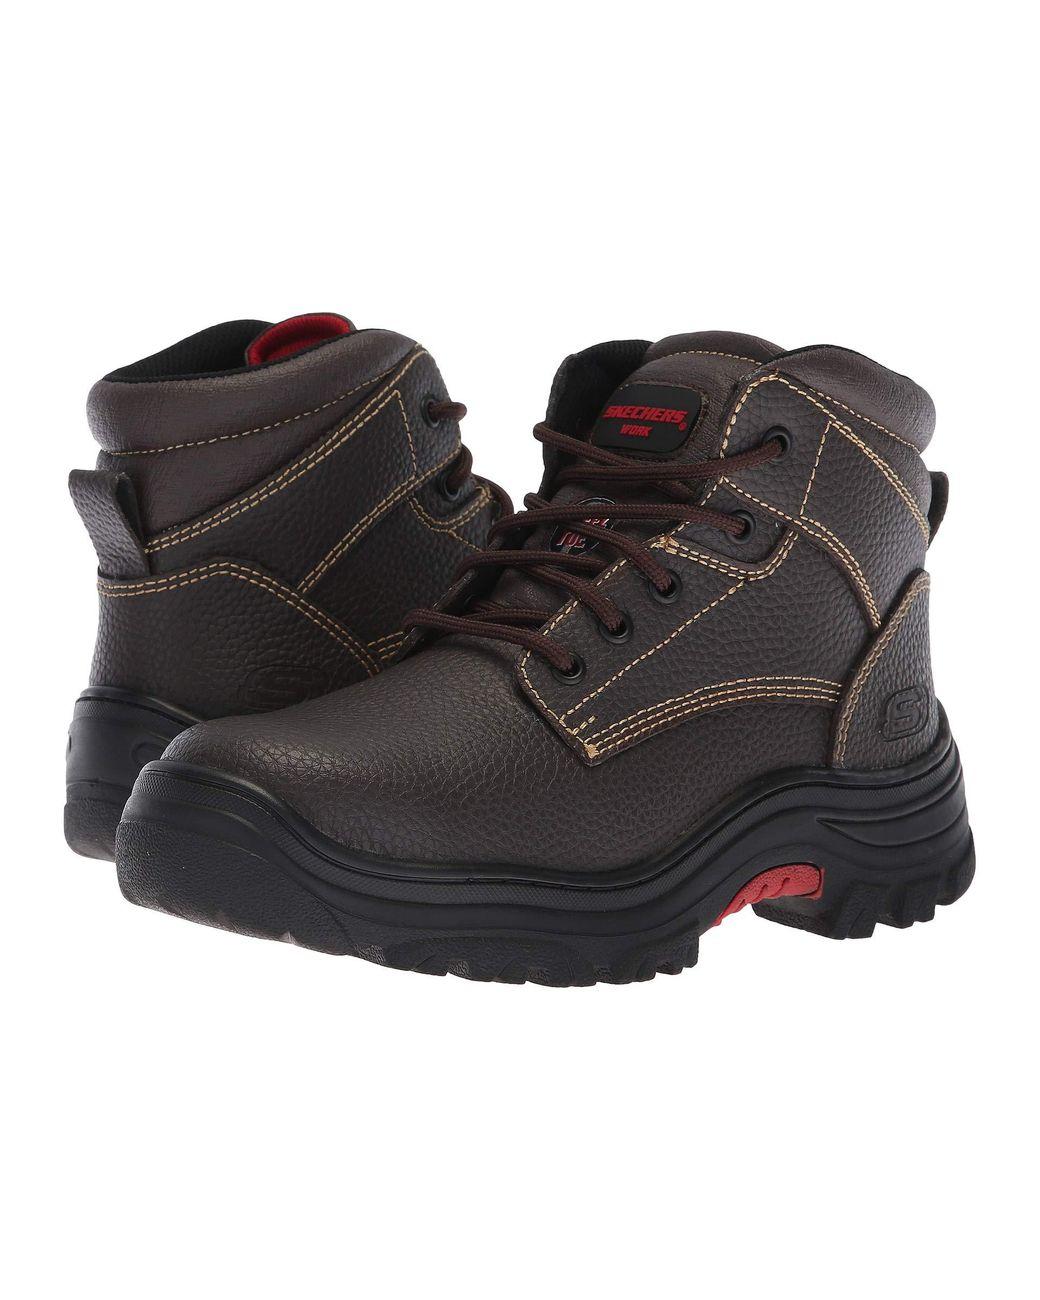 Skechers Work Burgin Taney Composite Toe Work Boots Womens